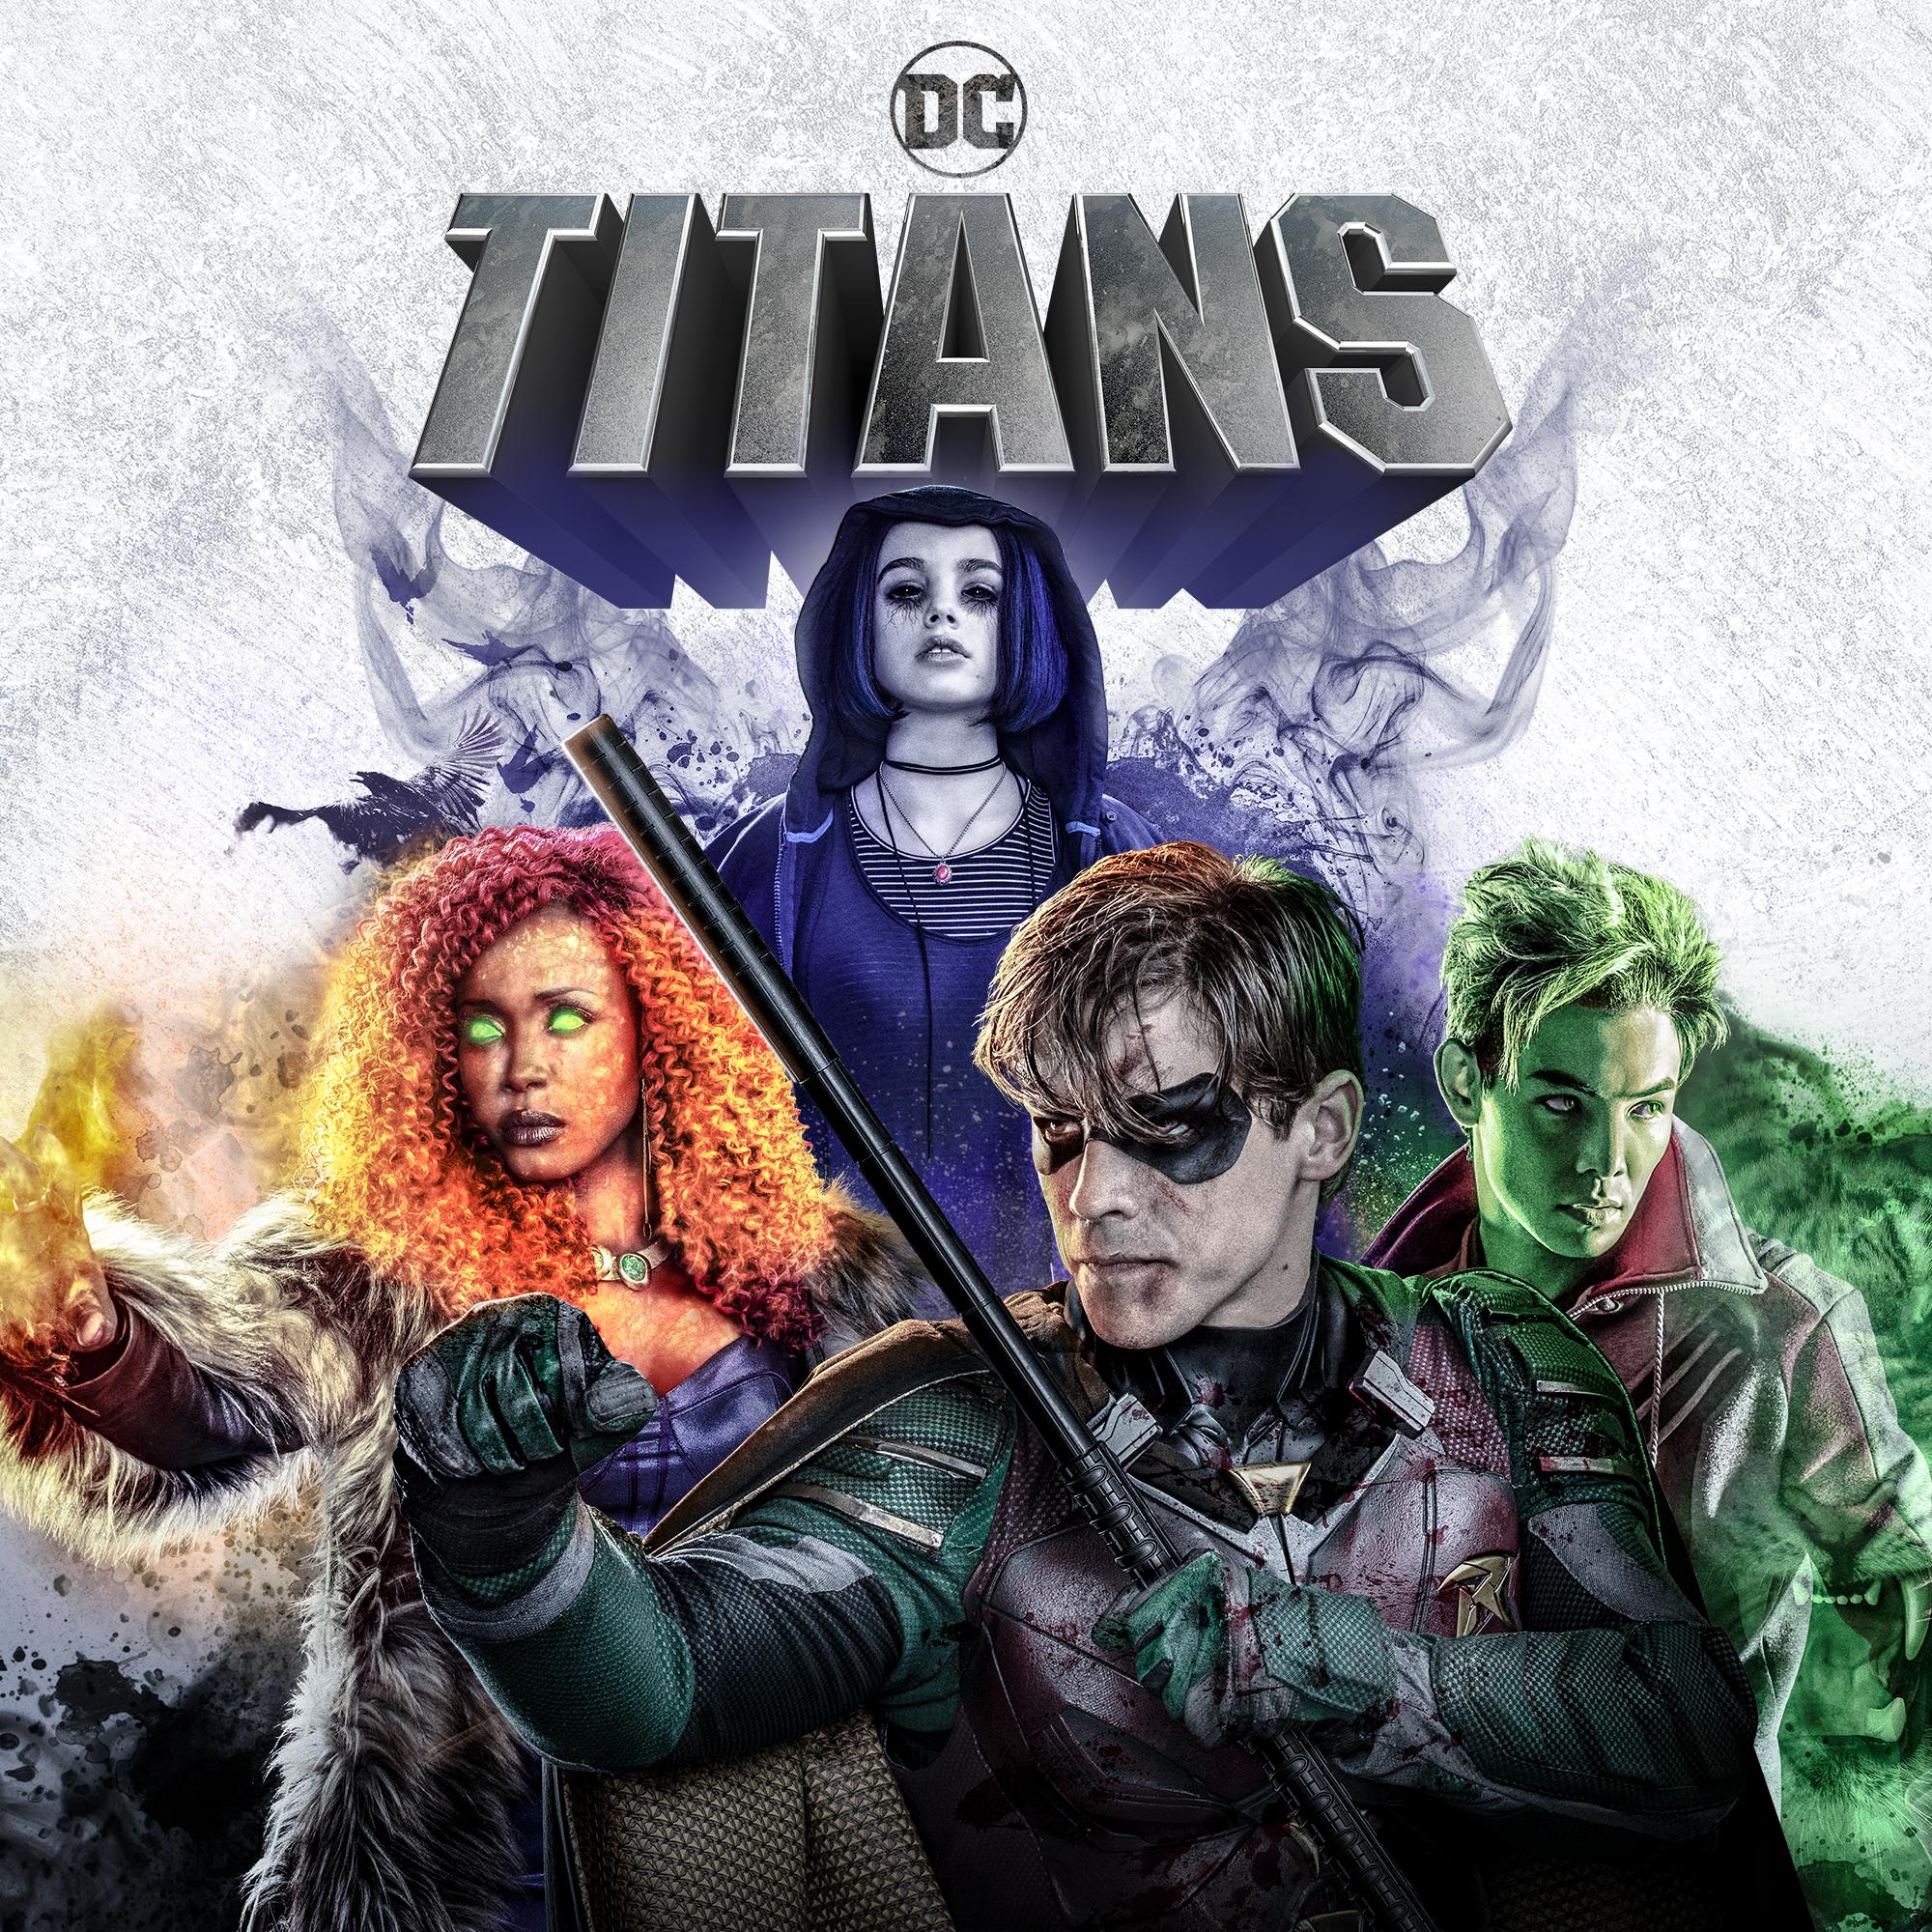 download teen titans season 1